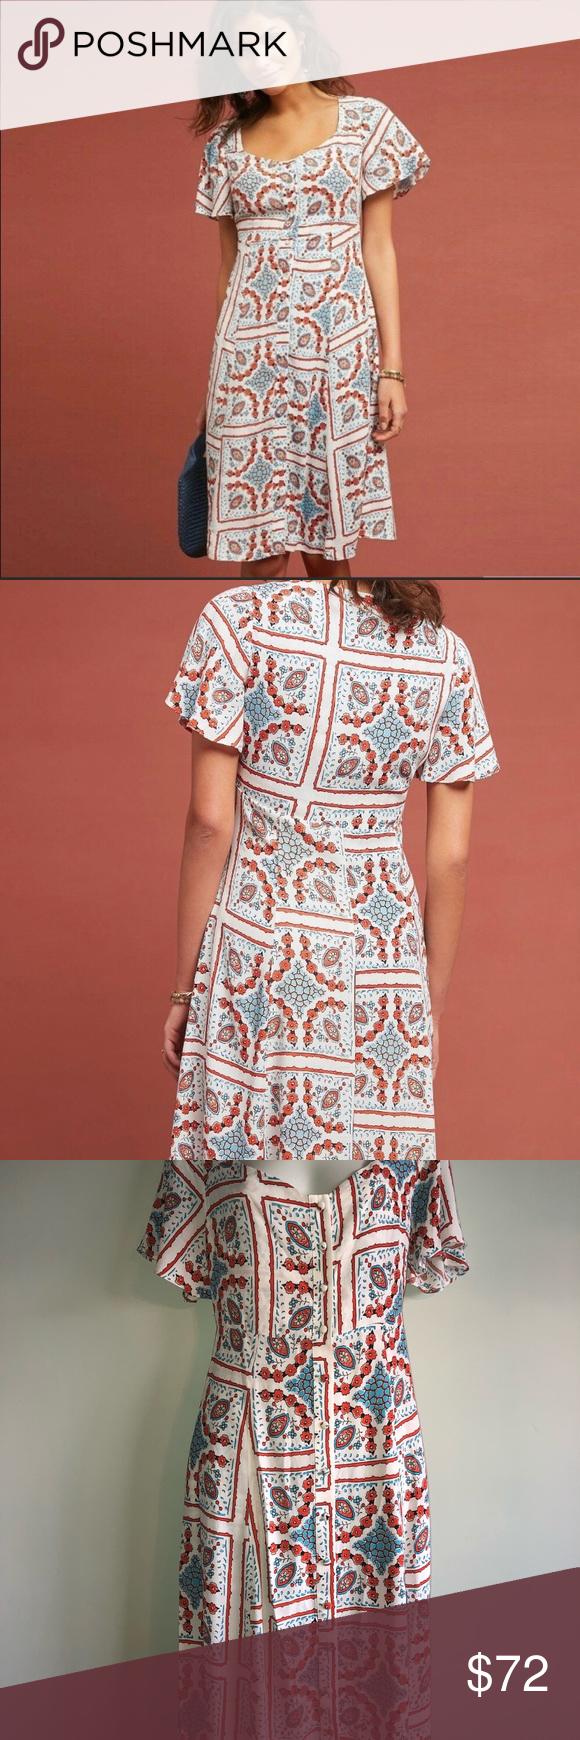 b11c00164148 Anthropologie Maeve Praslin Dress NWOT Maeve Praslin Flutter Sleeve Dress  for Anthropologie Size: 10 Condition